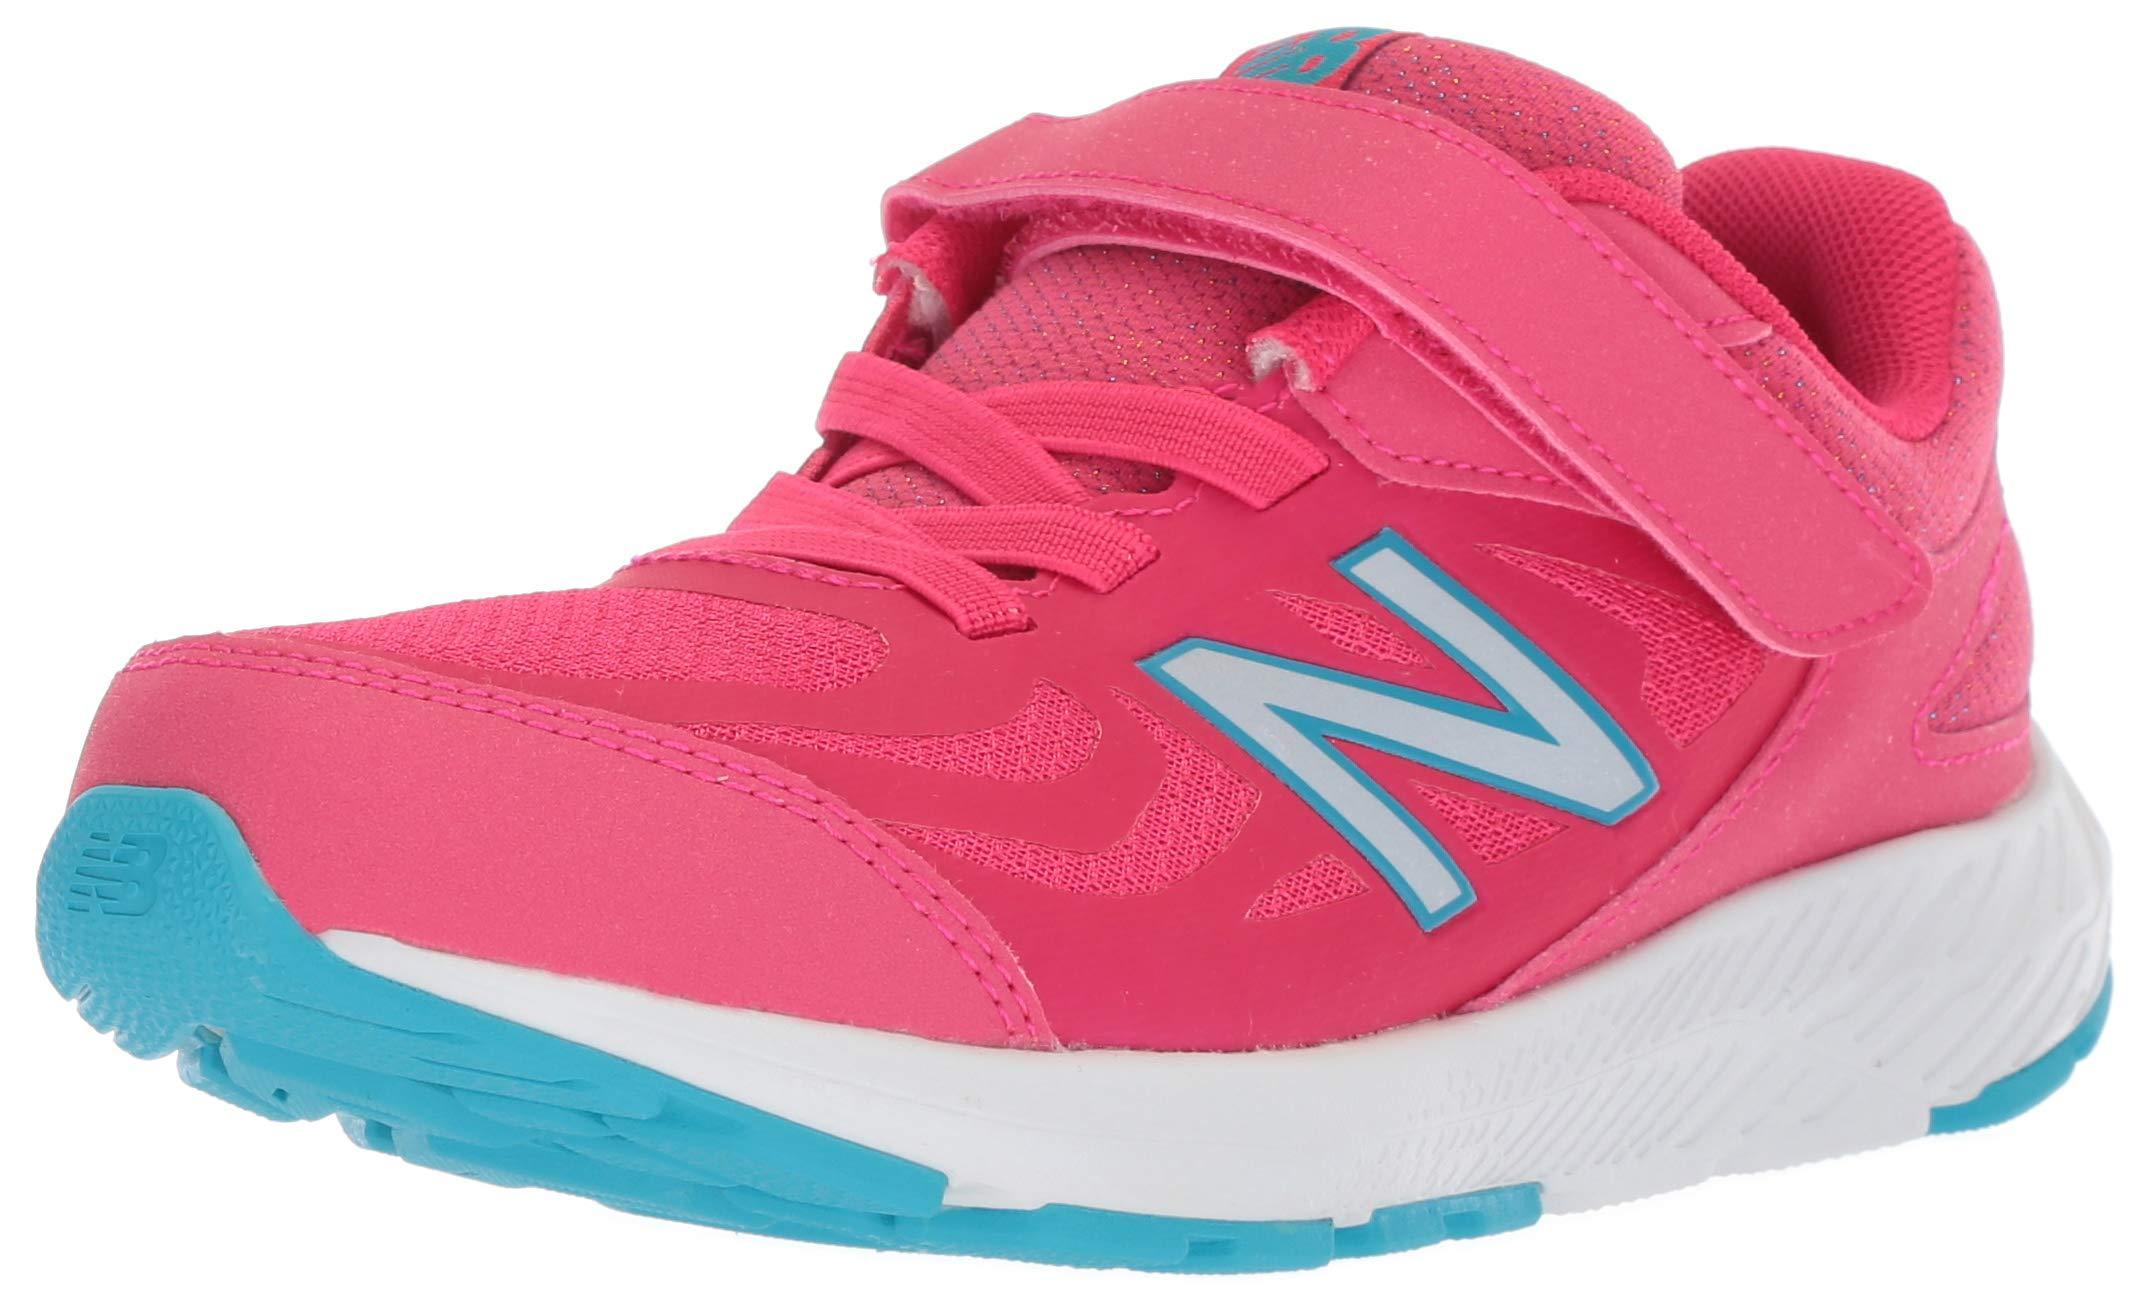 New Balance Girls' 519v1 Hook and Loop Running Shoe, Pomegranate/Rainbow 2 M US Little Kid